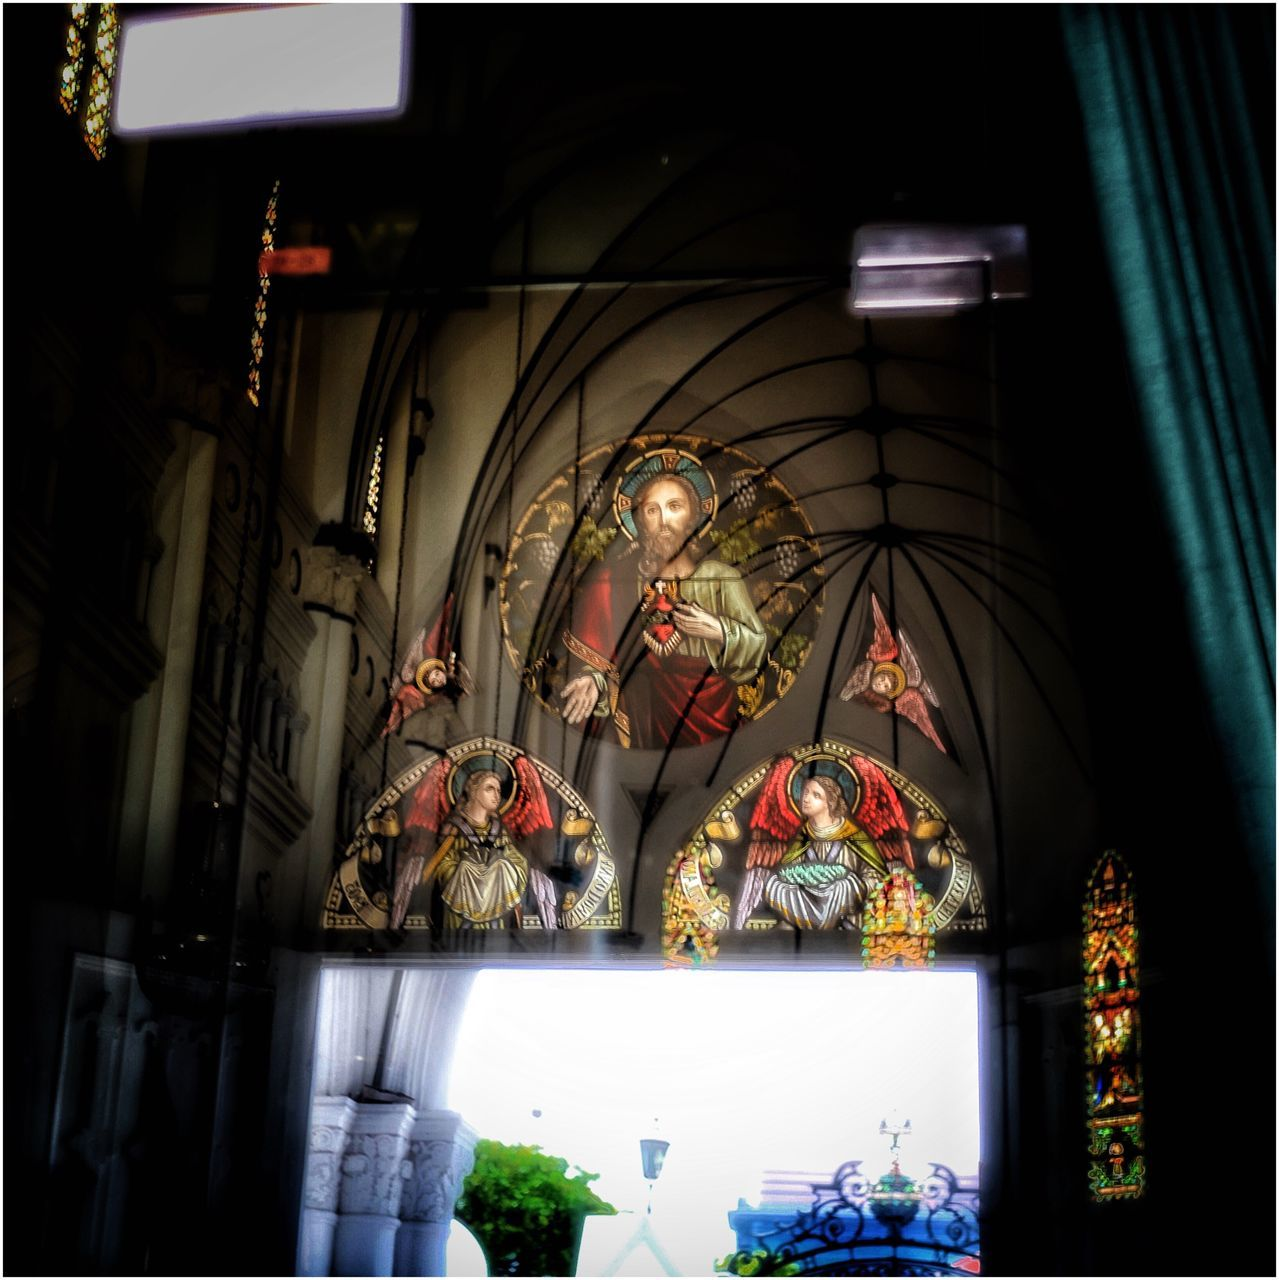 indoors, religion, spirituality, illuminated, place of worship, no people, hanging, statue, day